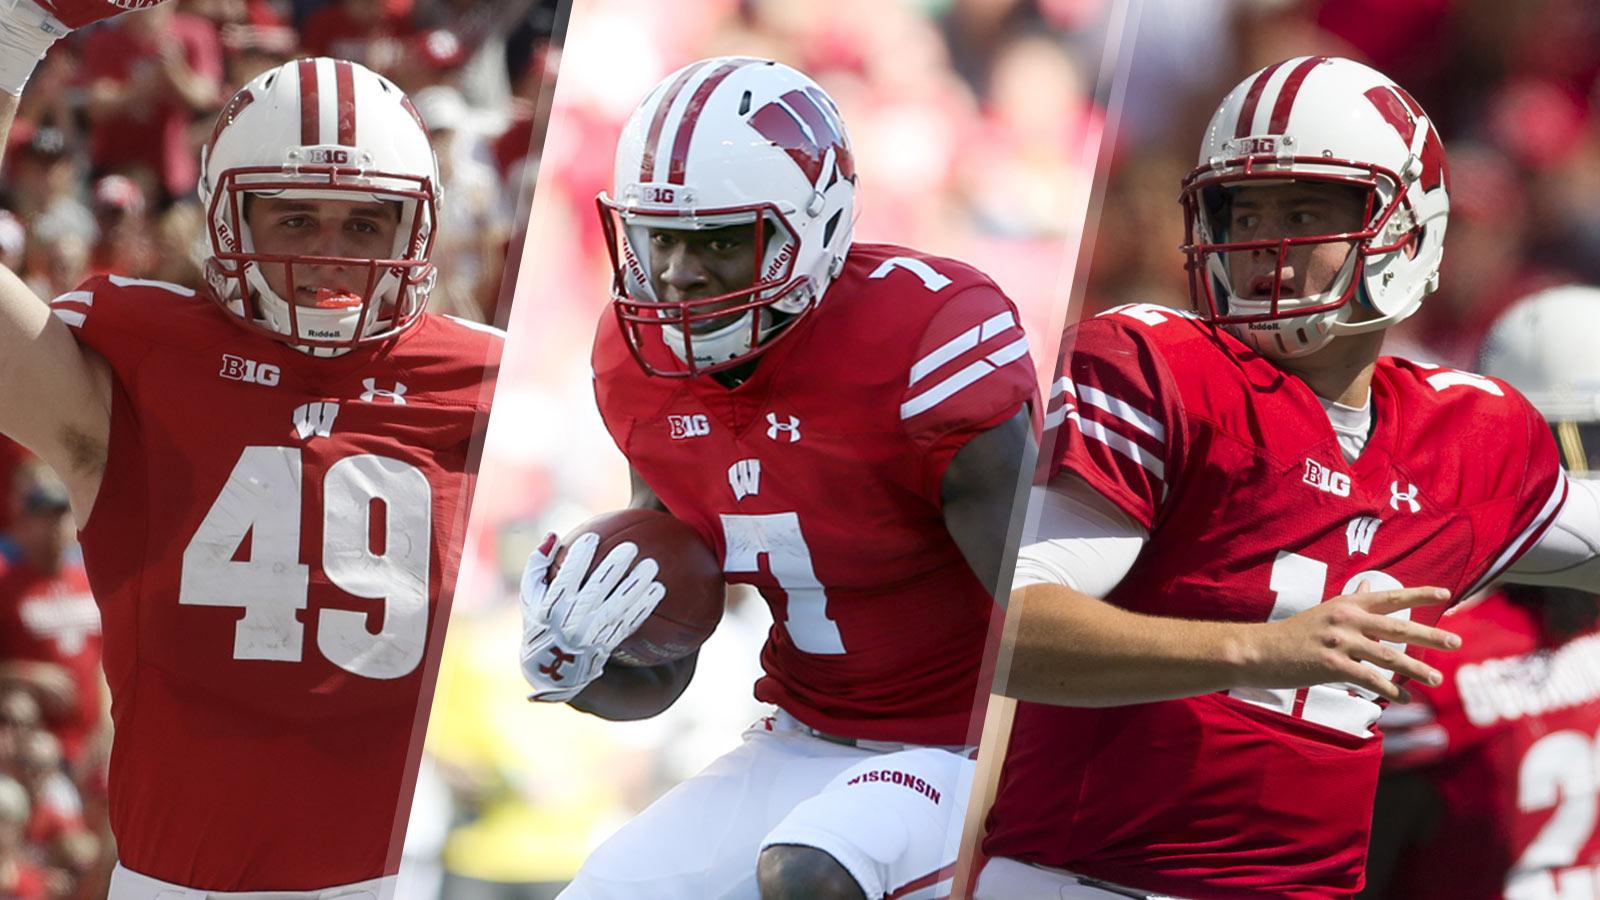 Young Badgers Tracker: Trio of redshirt freshmen make big impact